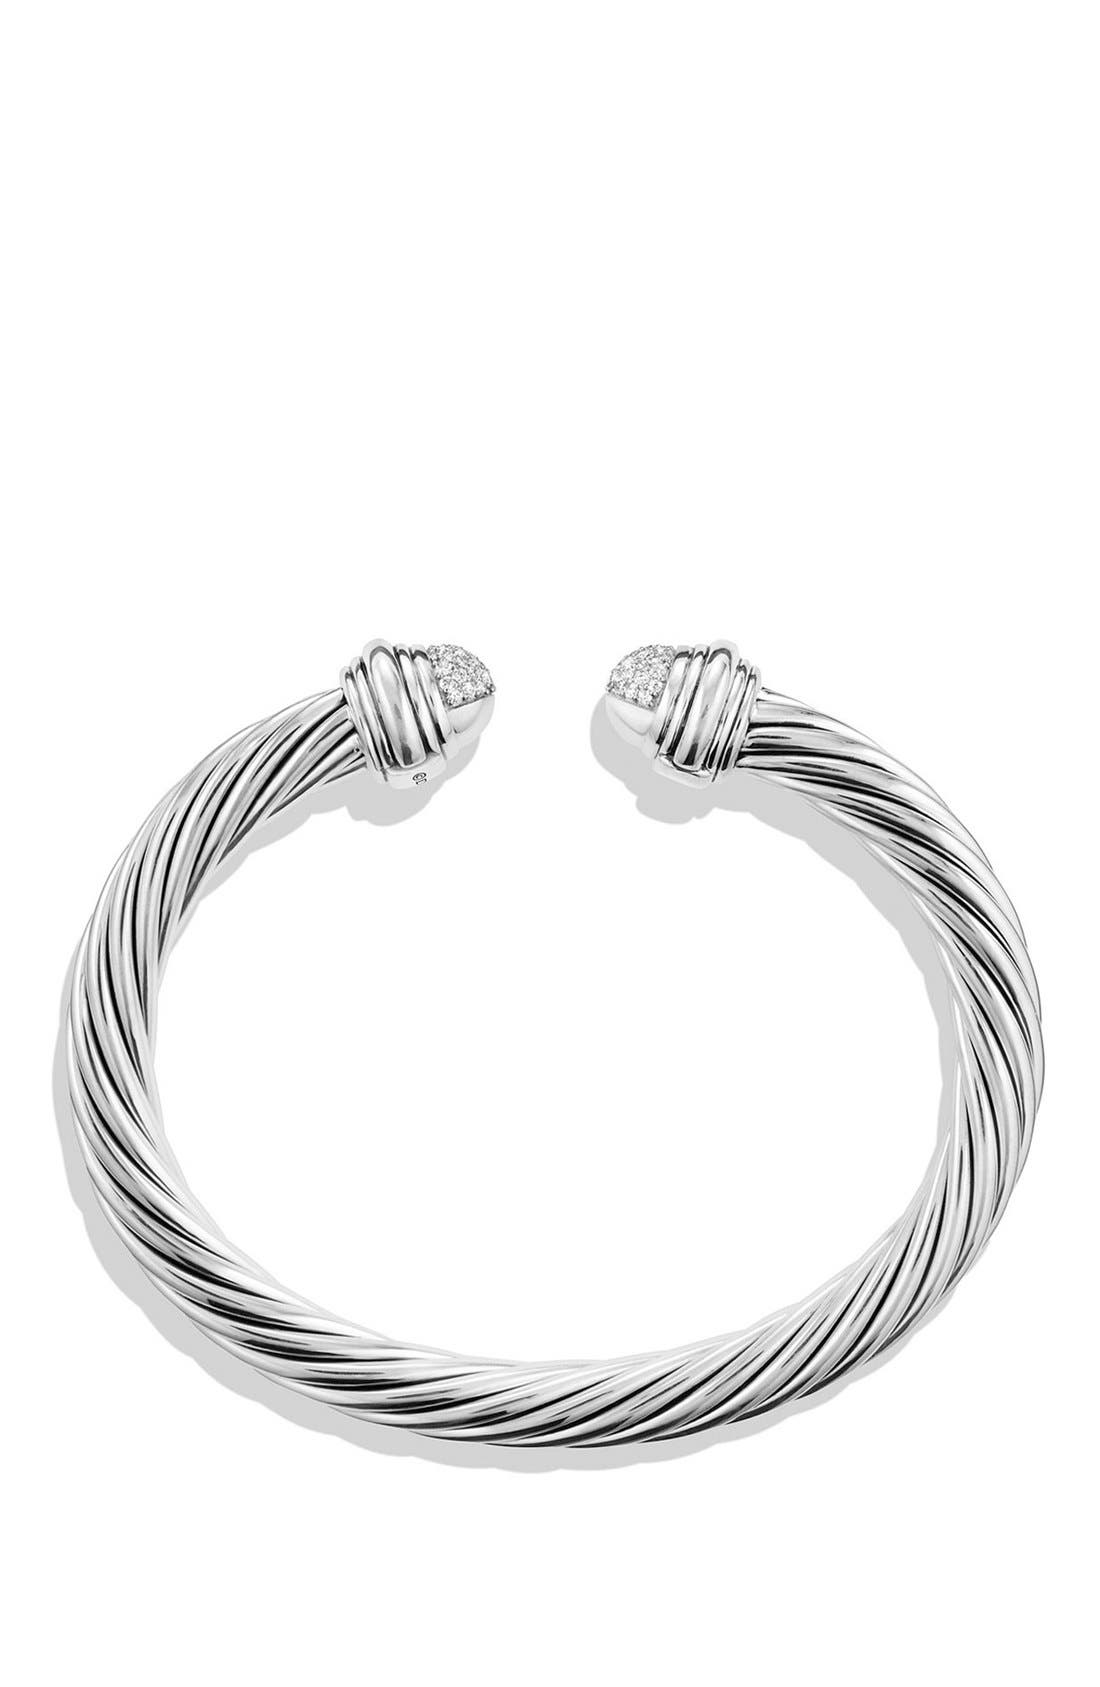 Cable Classics Bracelet with Black Diamonds, 7mm,                             Alternate thumbnail 2, color,                             SILVER